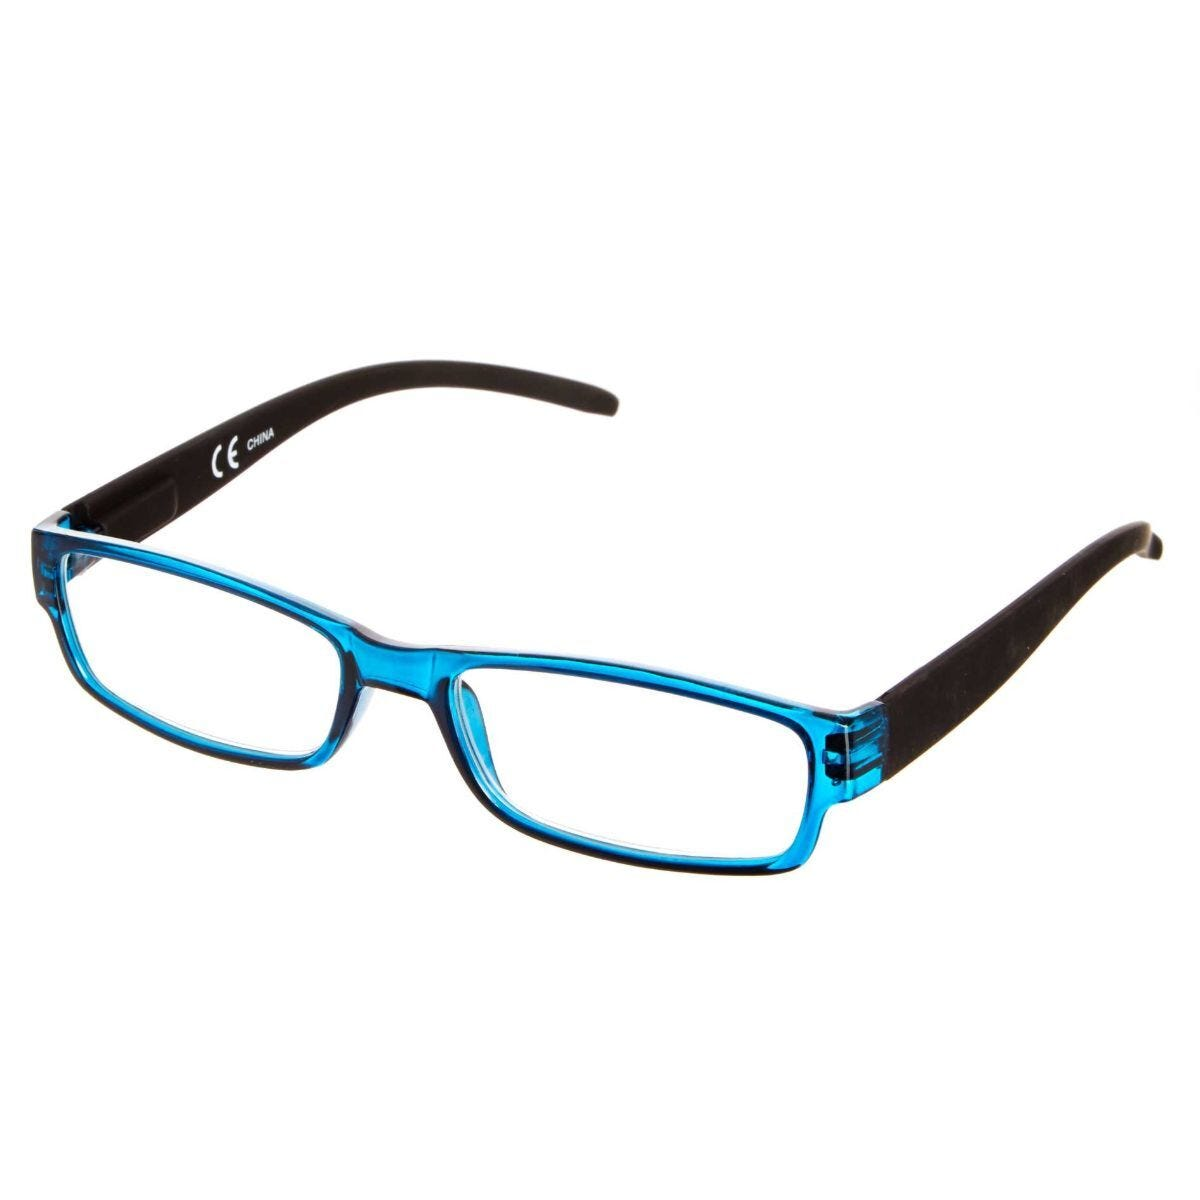 Ryman Reading Glasses + 1.0 Blue Plastic Frame